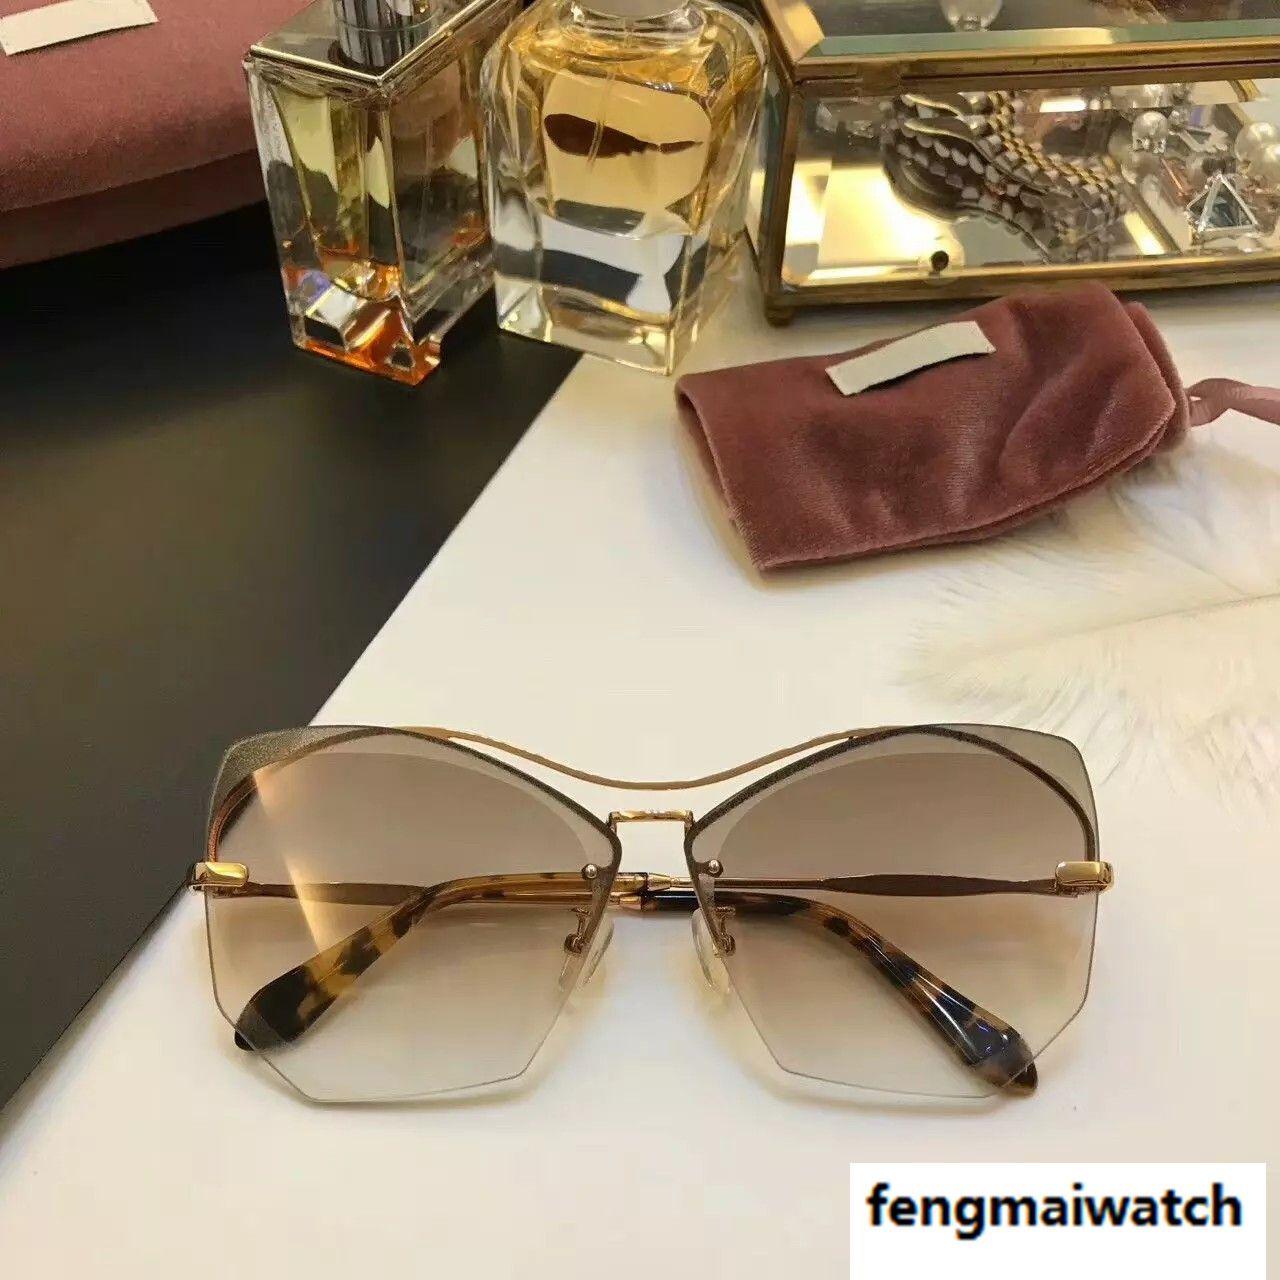 daa1e2709f Newest Fashion Deisnger Sunglasses for Women Brand Deisnger Color Fashion  Summer Style Uv400 Lens Women Sunglasses 52S with Original Box Online with  ...